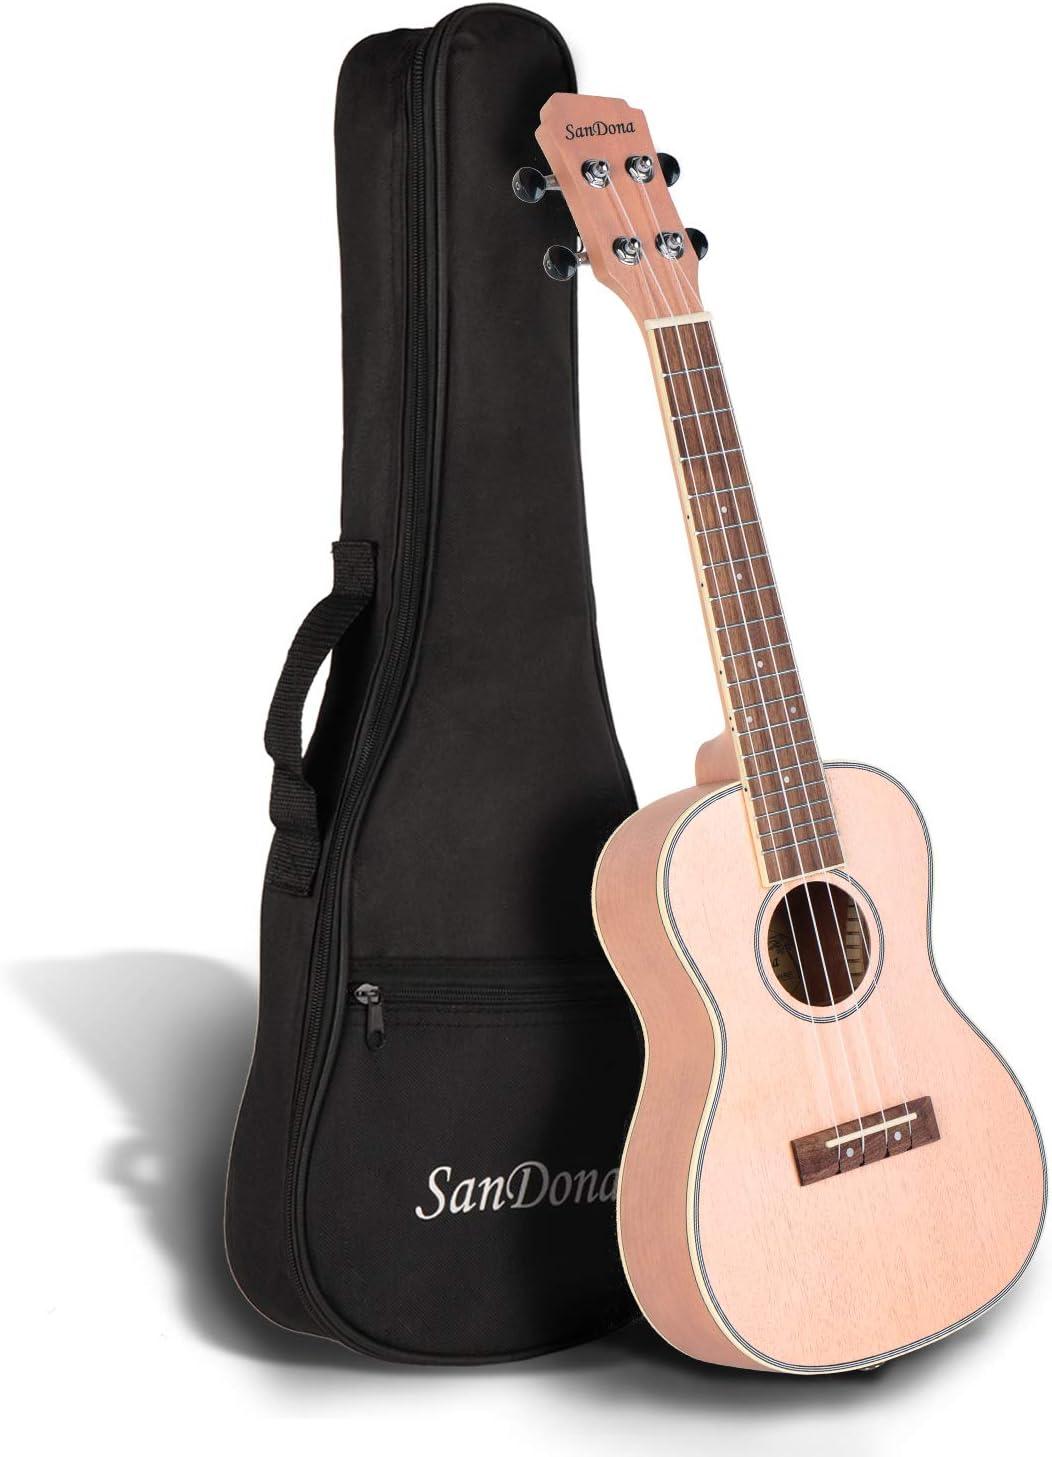 SanDona Concert Ukulele 24 Inch Branded goods Okoume Shipping included Kit Solid UKCB-MH Wood